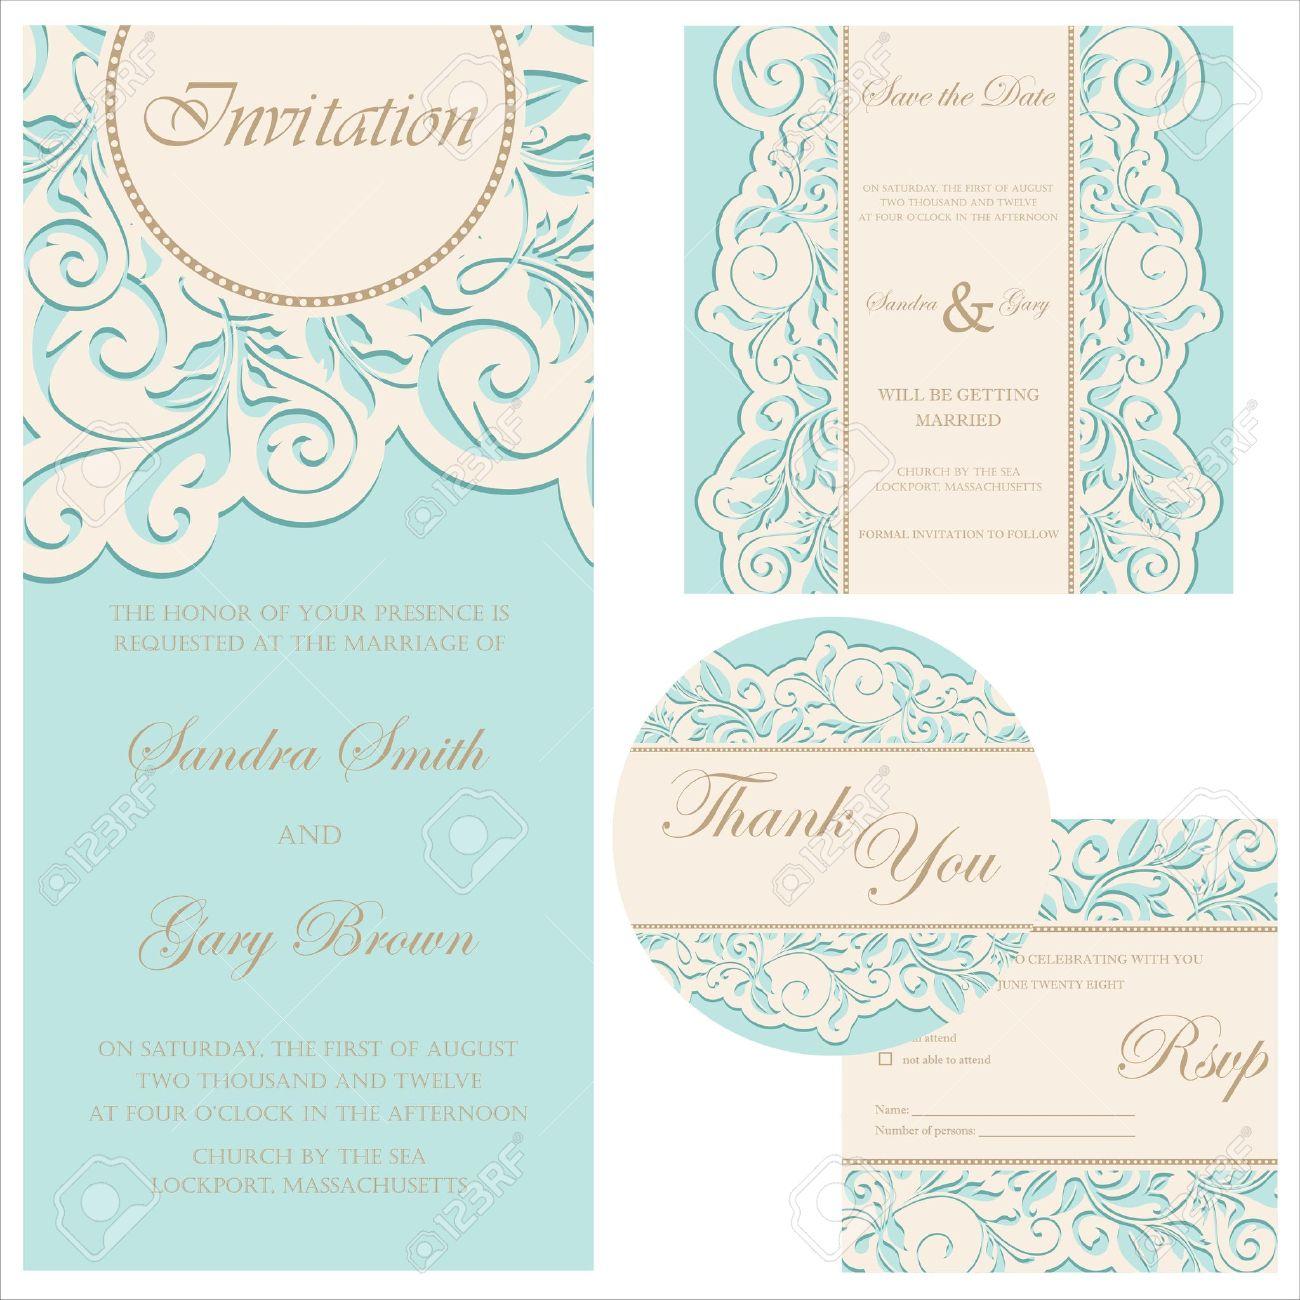 Wedding invitation set  wedding invitation, thank you card, save the date card, RSVP card Stock Vector - 19704198